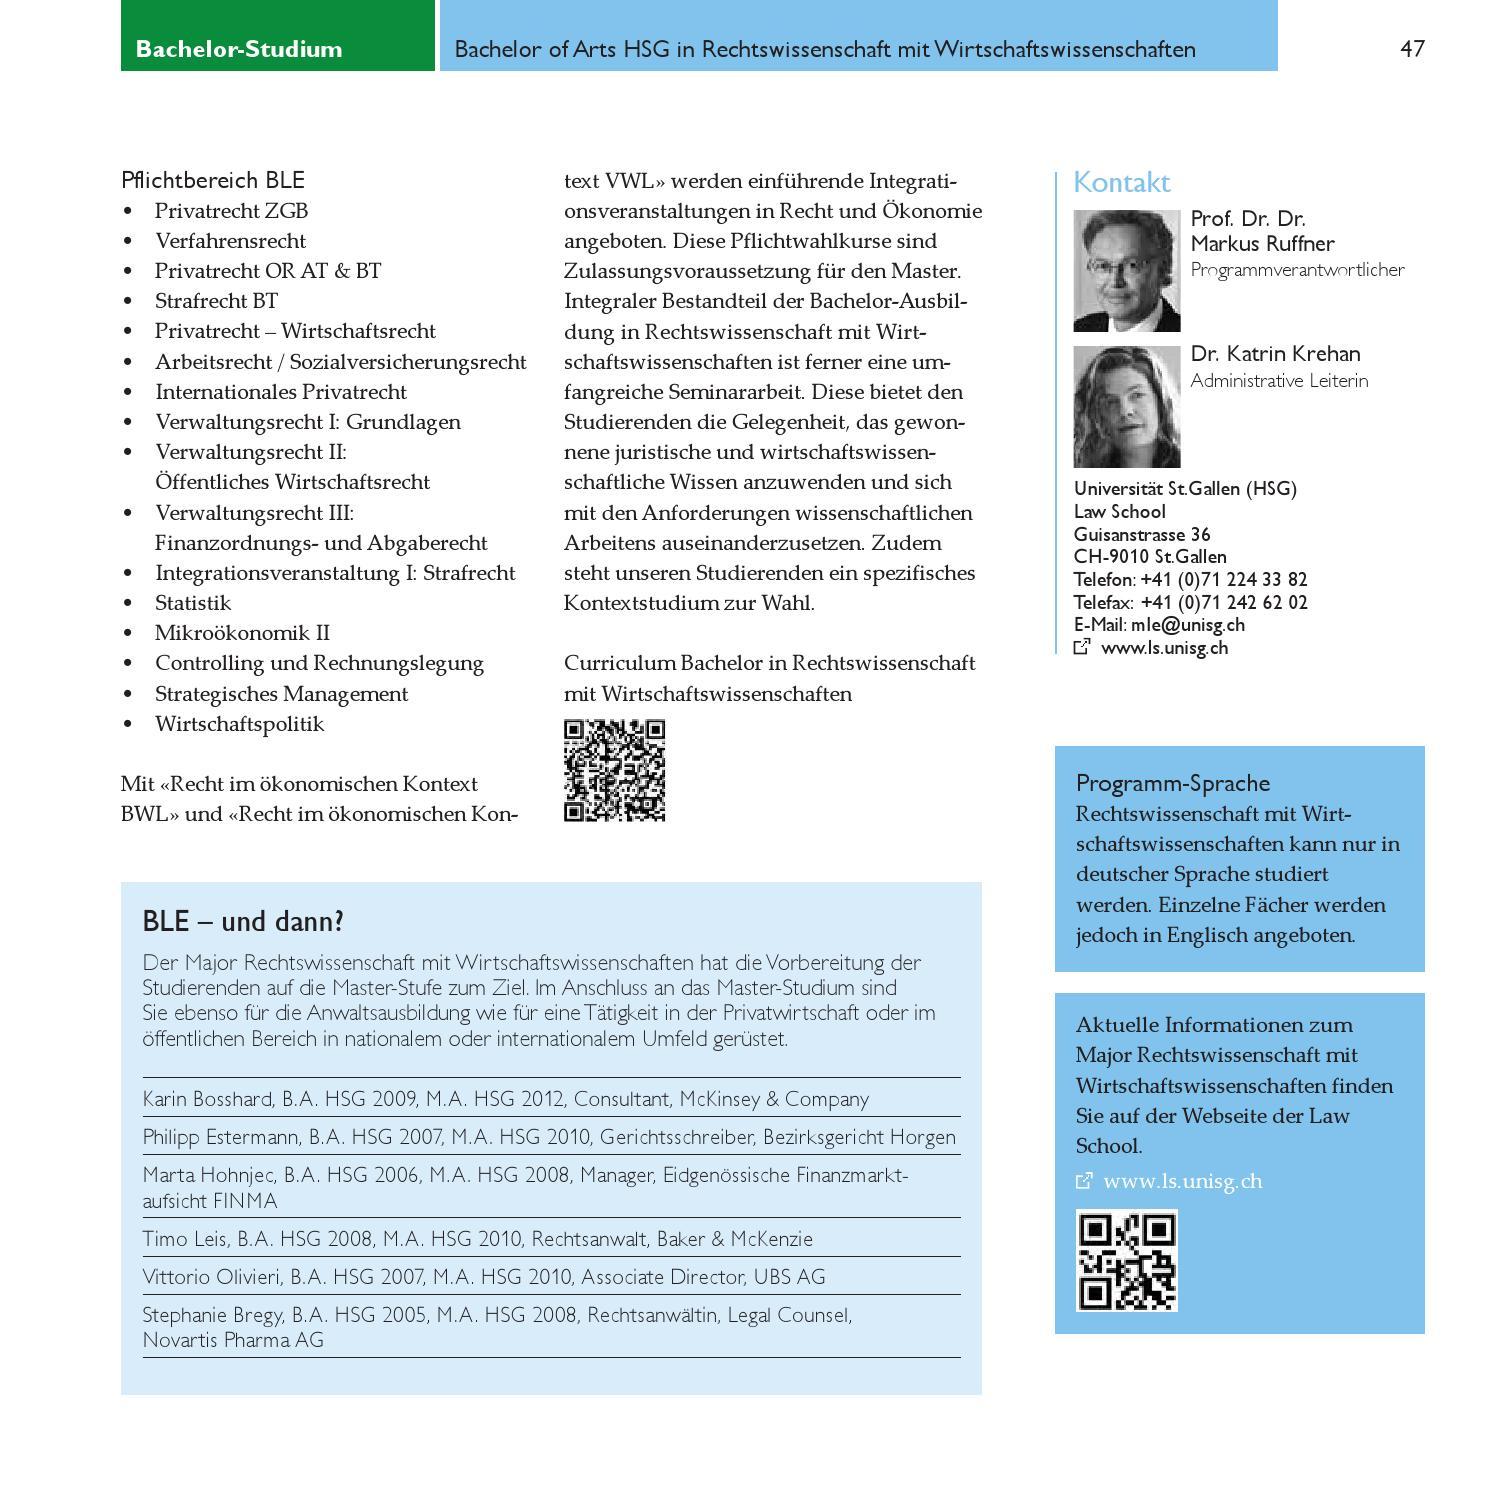 Bachelor-Studium / Undergraduate Studies by Universität St.Gallen ...